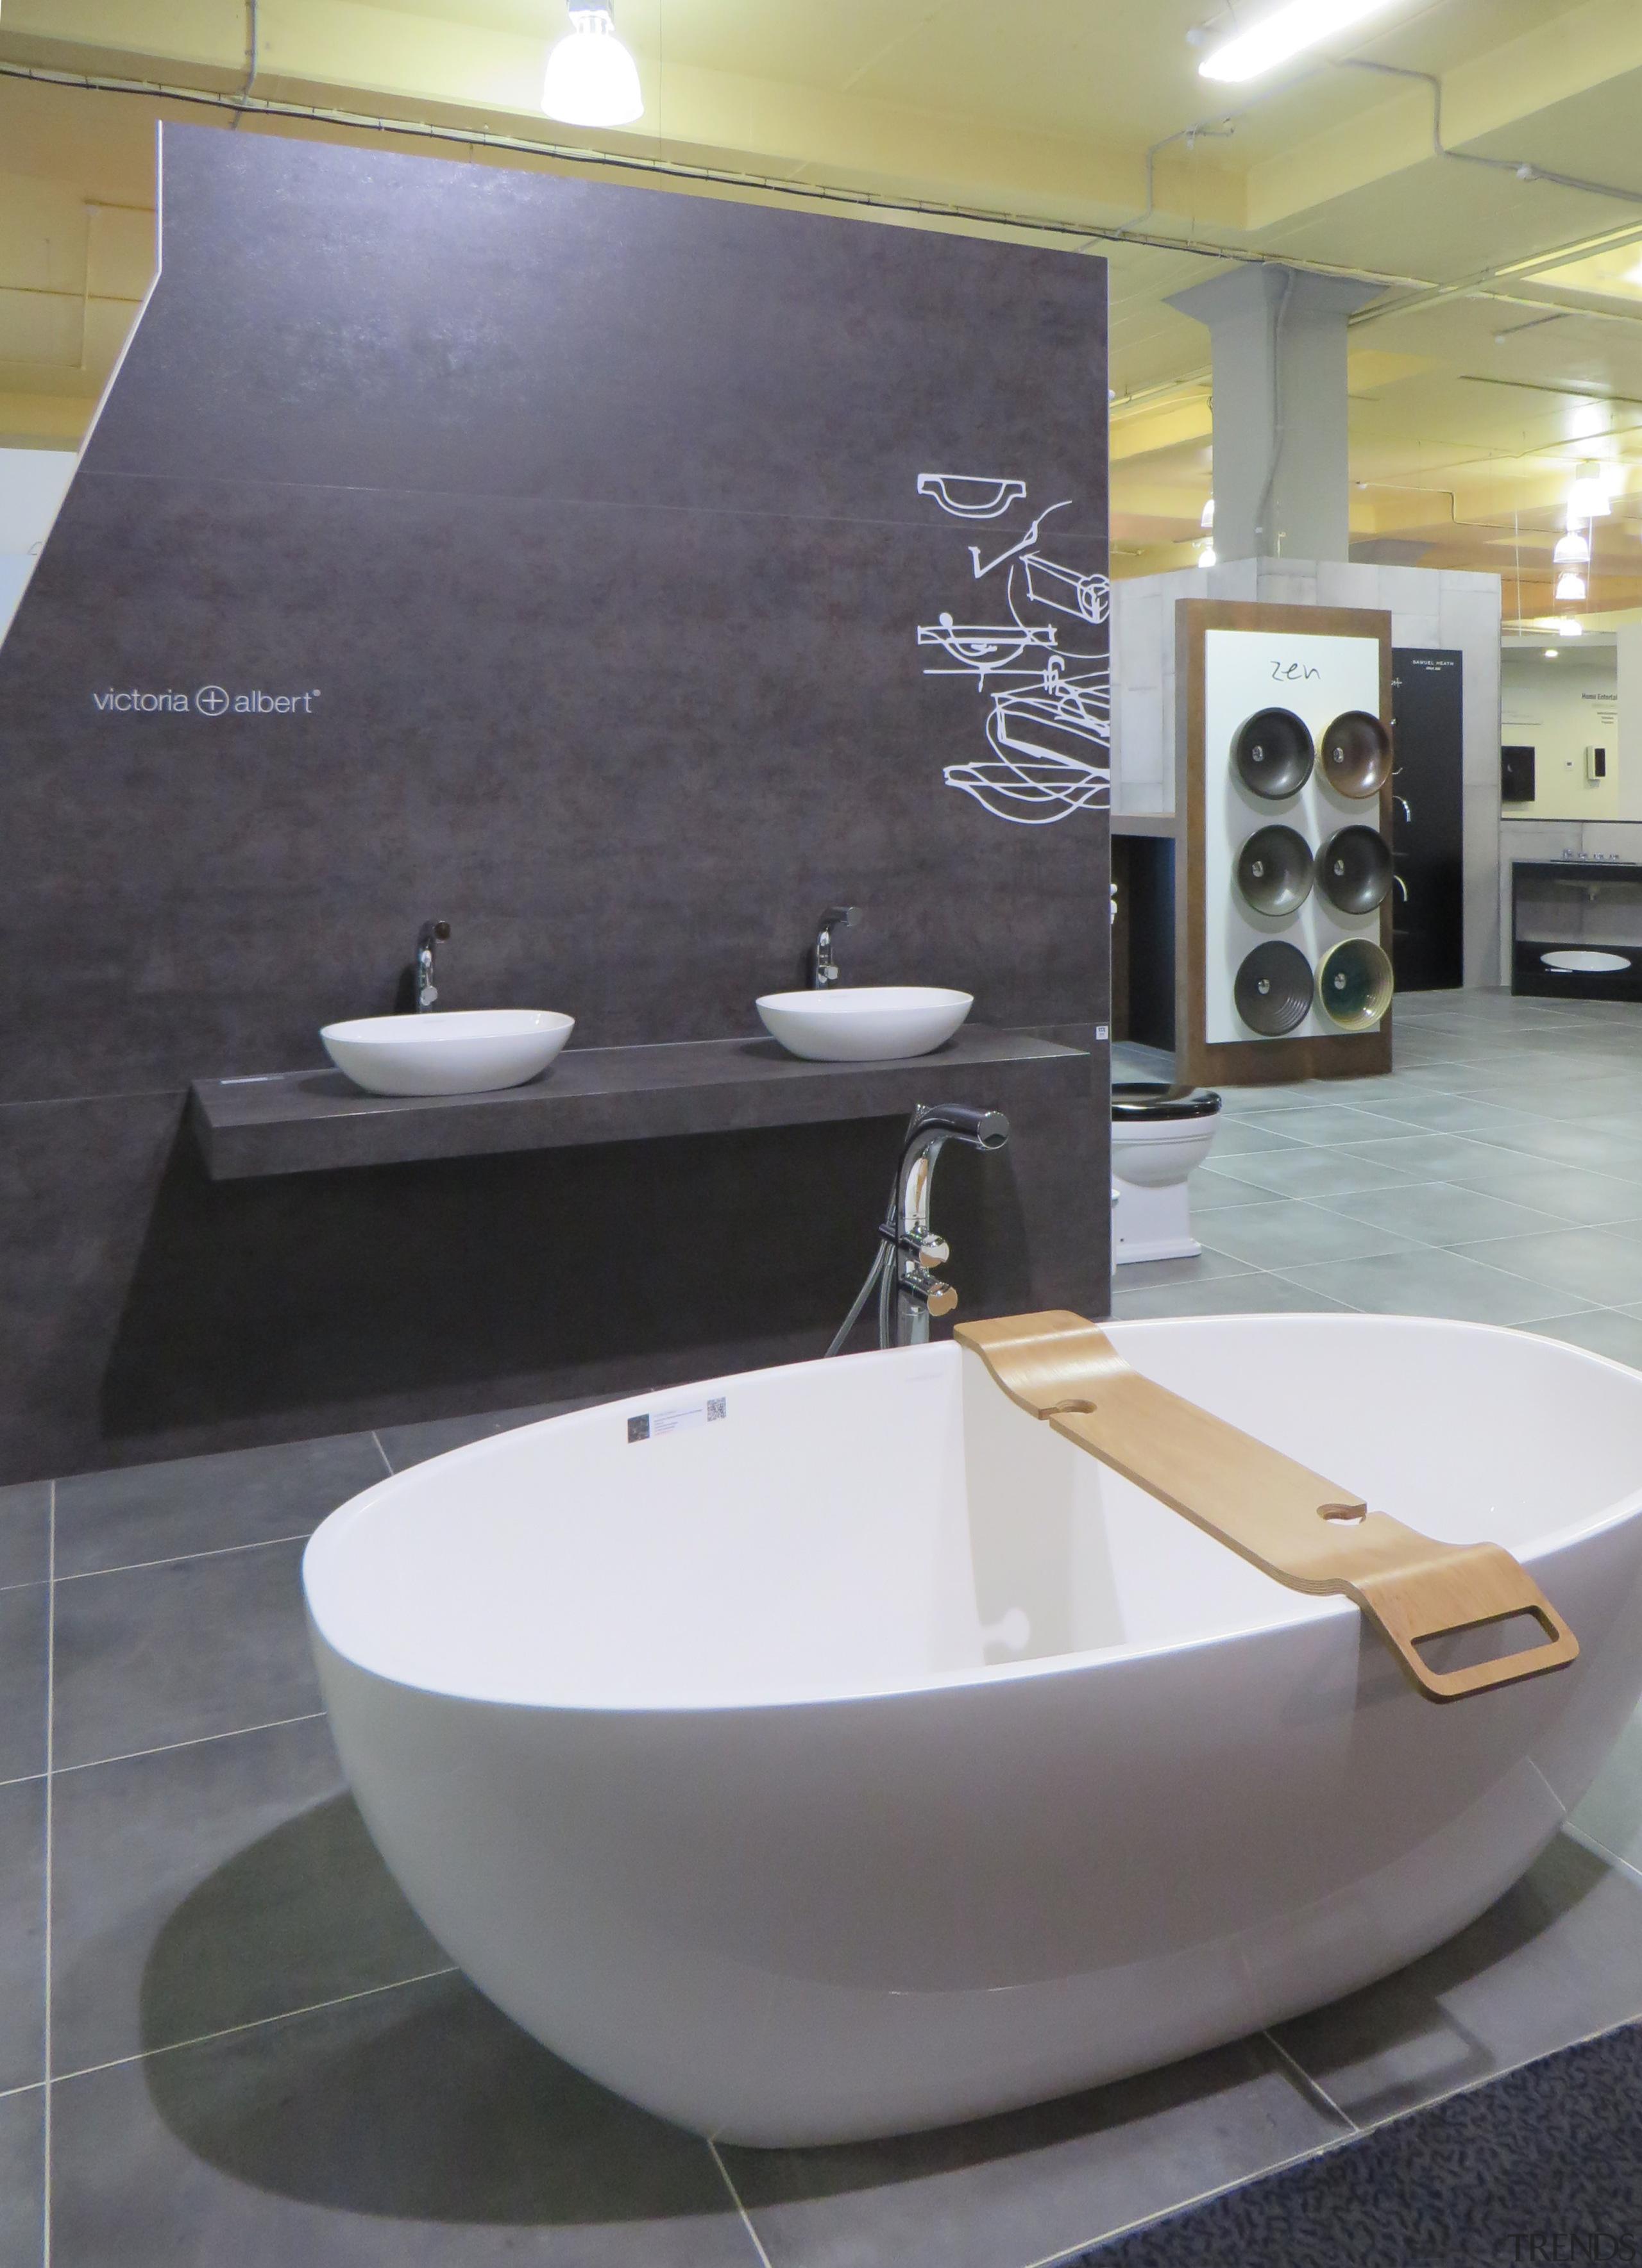 Freestanding tubs, vessel basins and bathroom accessories are architecture, bathroom, ceramic, floor, flooring, interior design, plumbing fixture, product design, sink, tap, tile, gray